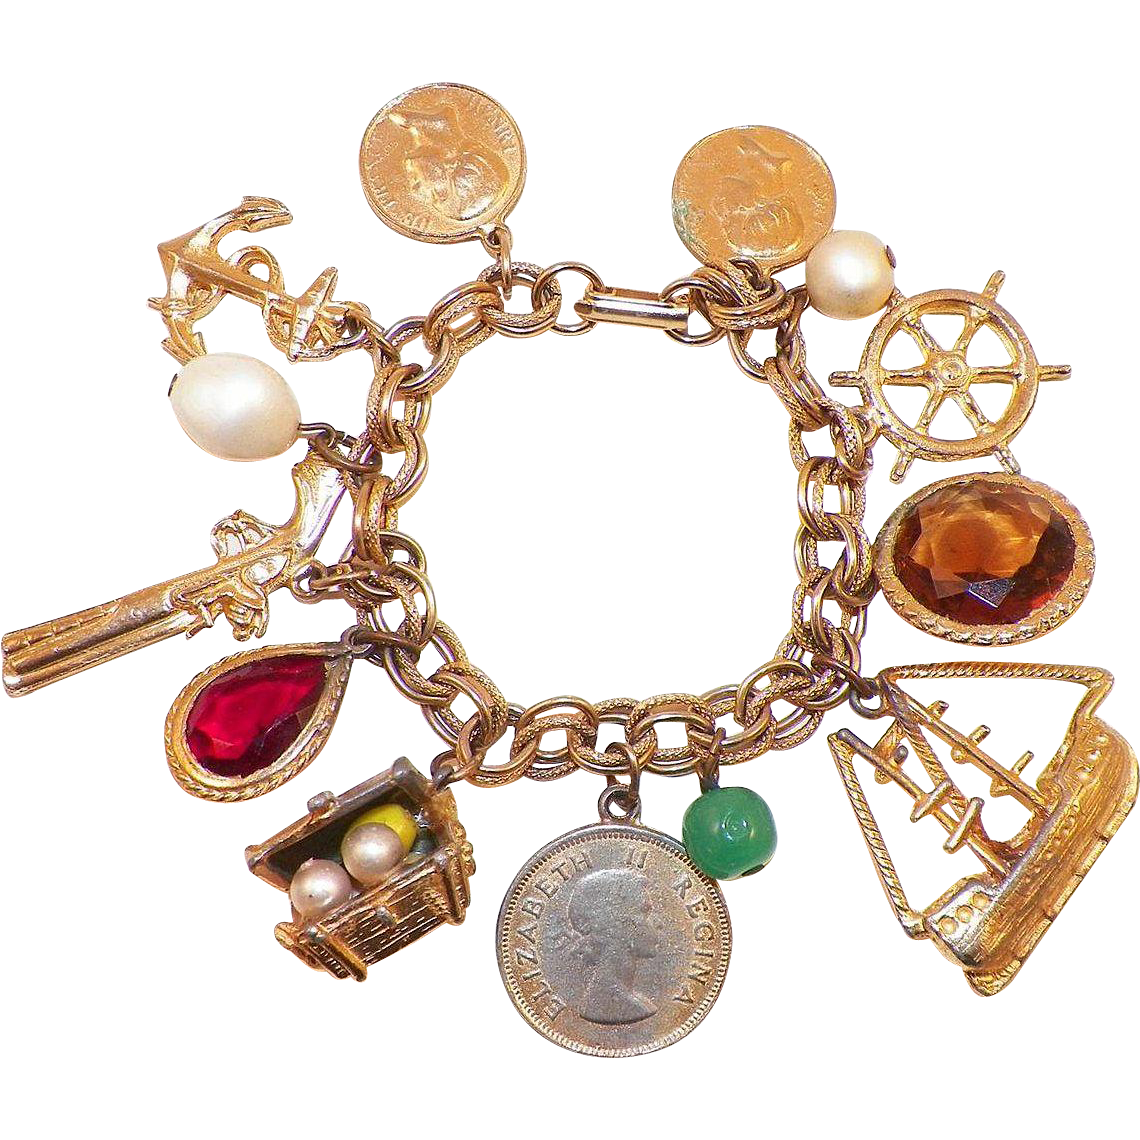 Vintage Whimsical Costume Charm Bracelet